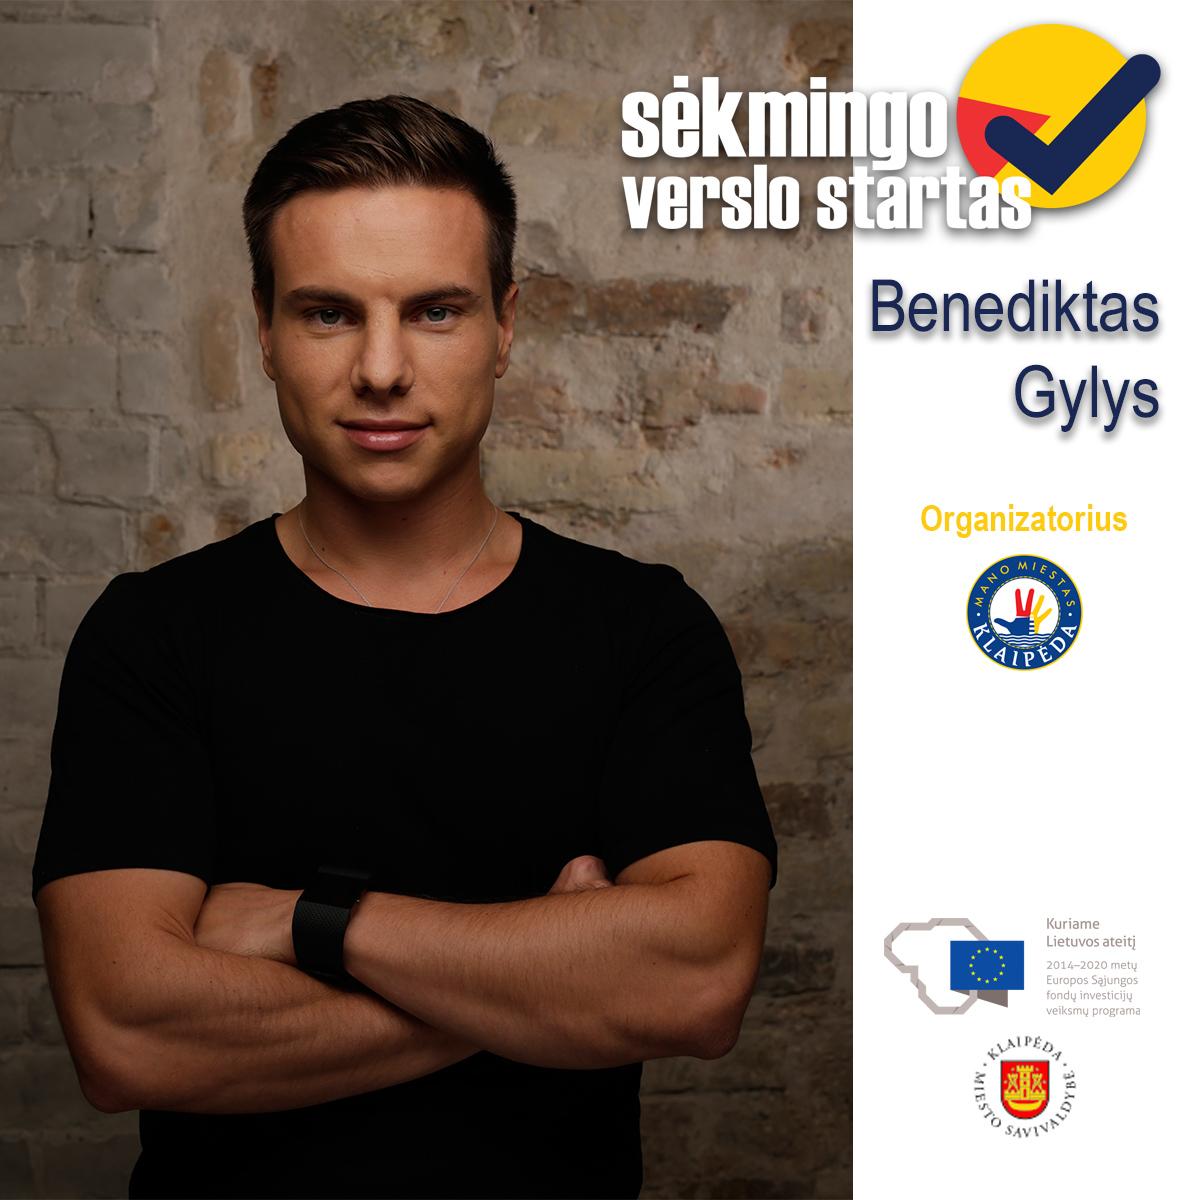 Benediktas Gylys 1